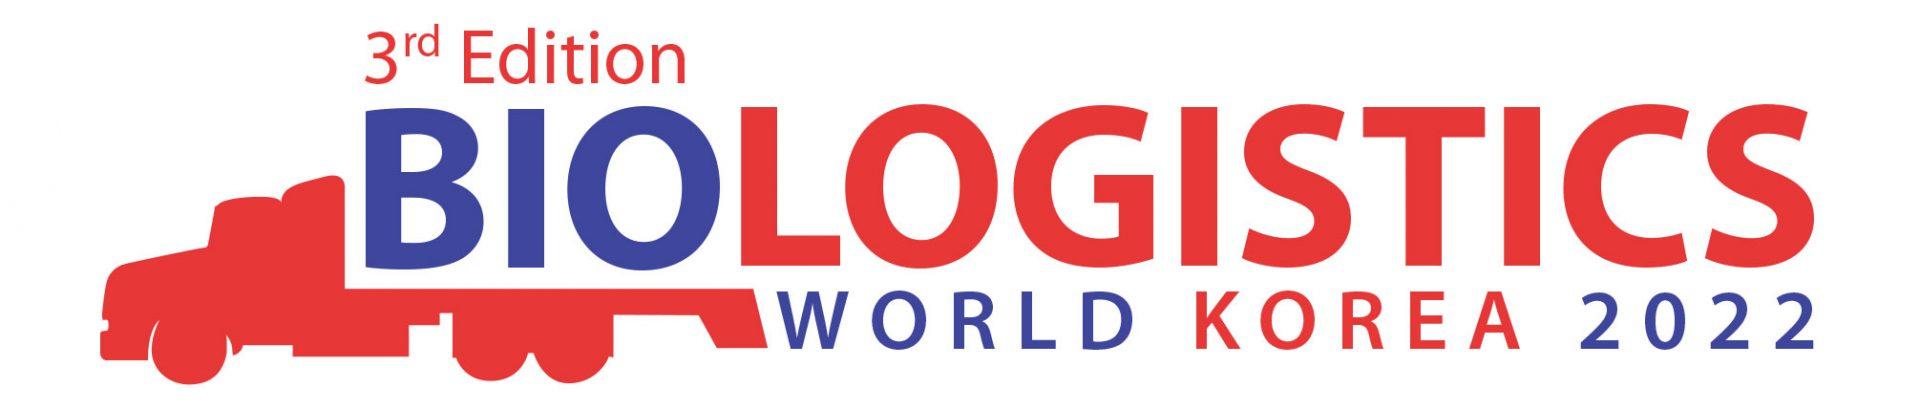 biologistics korea logo